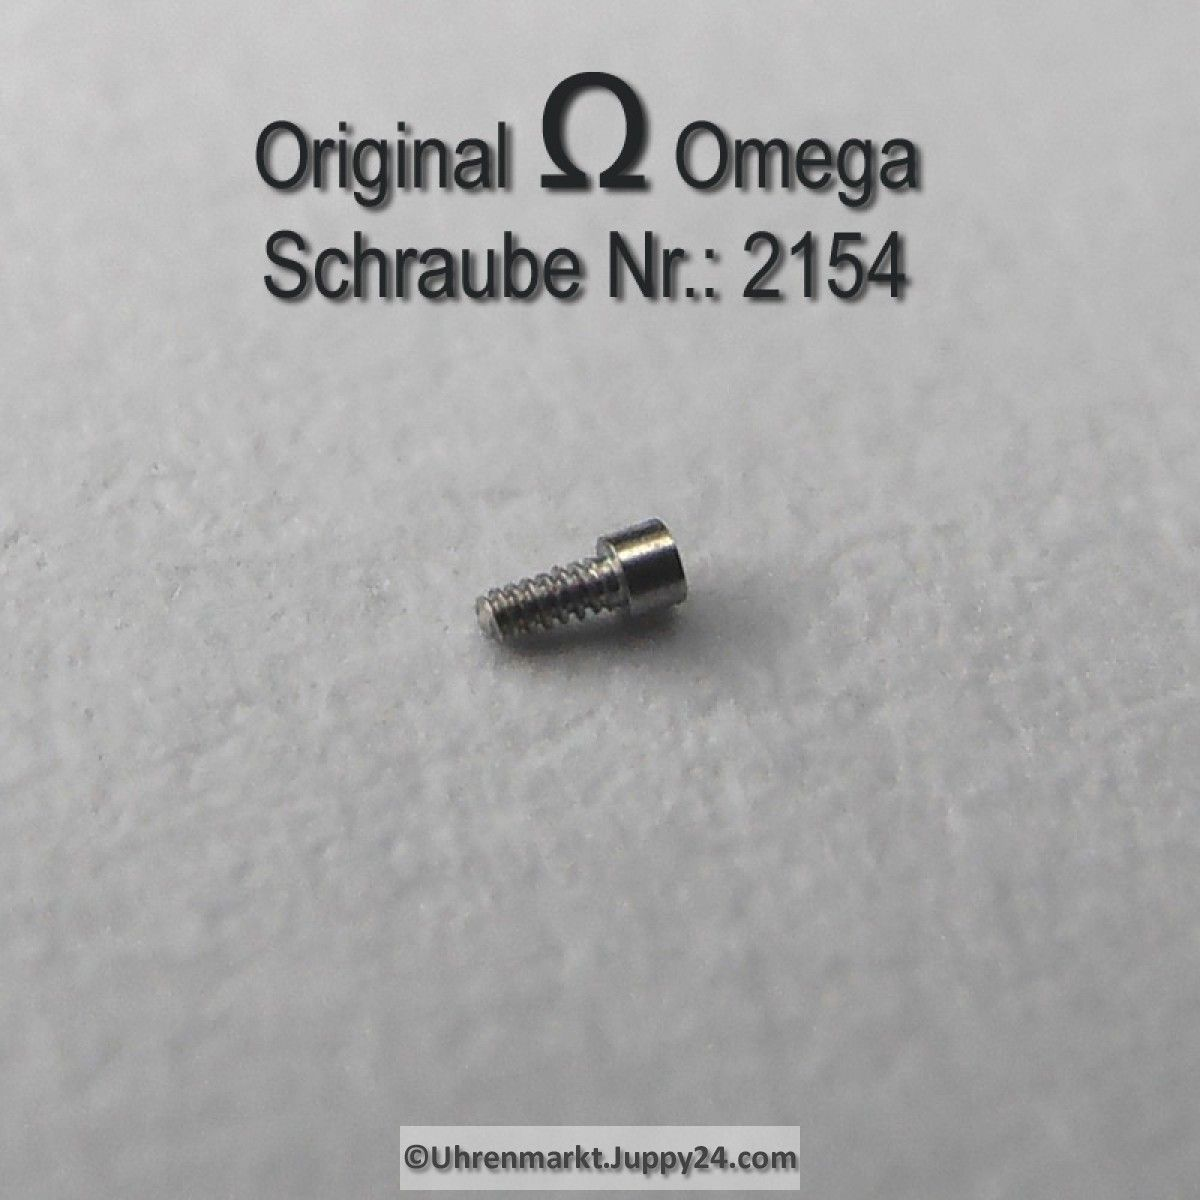 Omega Schraube 2154 Part Nr. Omega 2154 - Omega Ersatzteile -